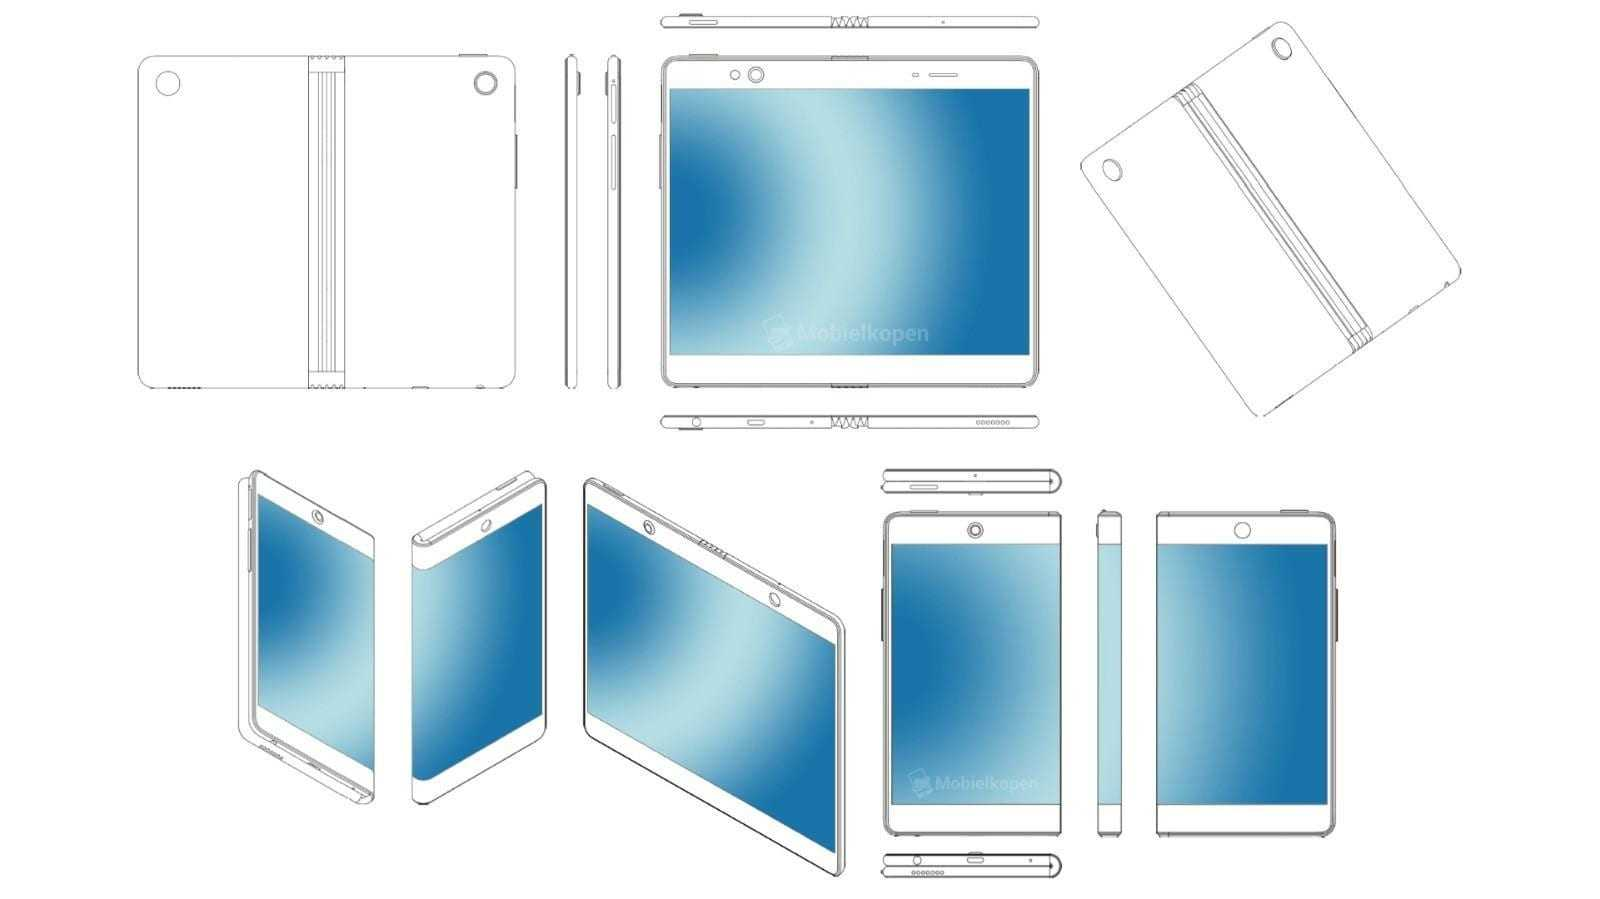 Oppo представит гибкий смартфон в феврале следующего года (oppo foldable smartphone patent 3)